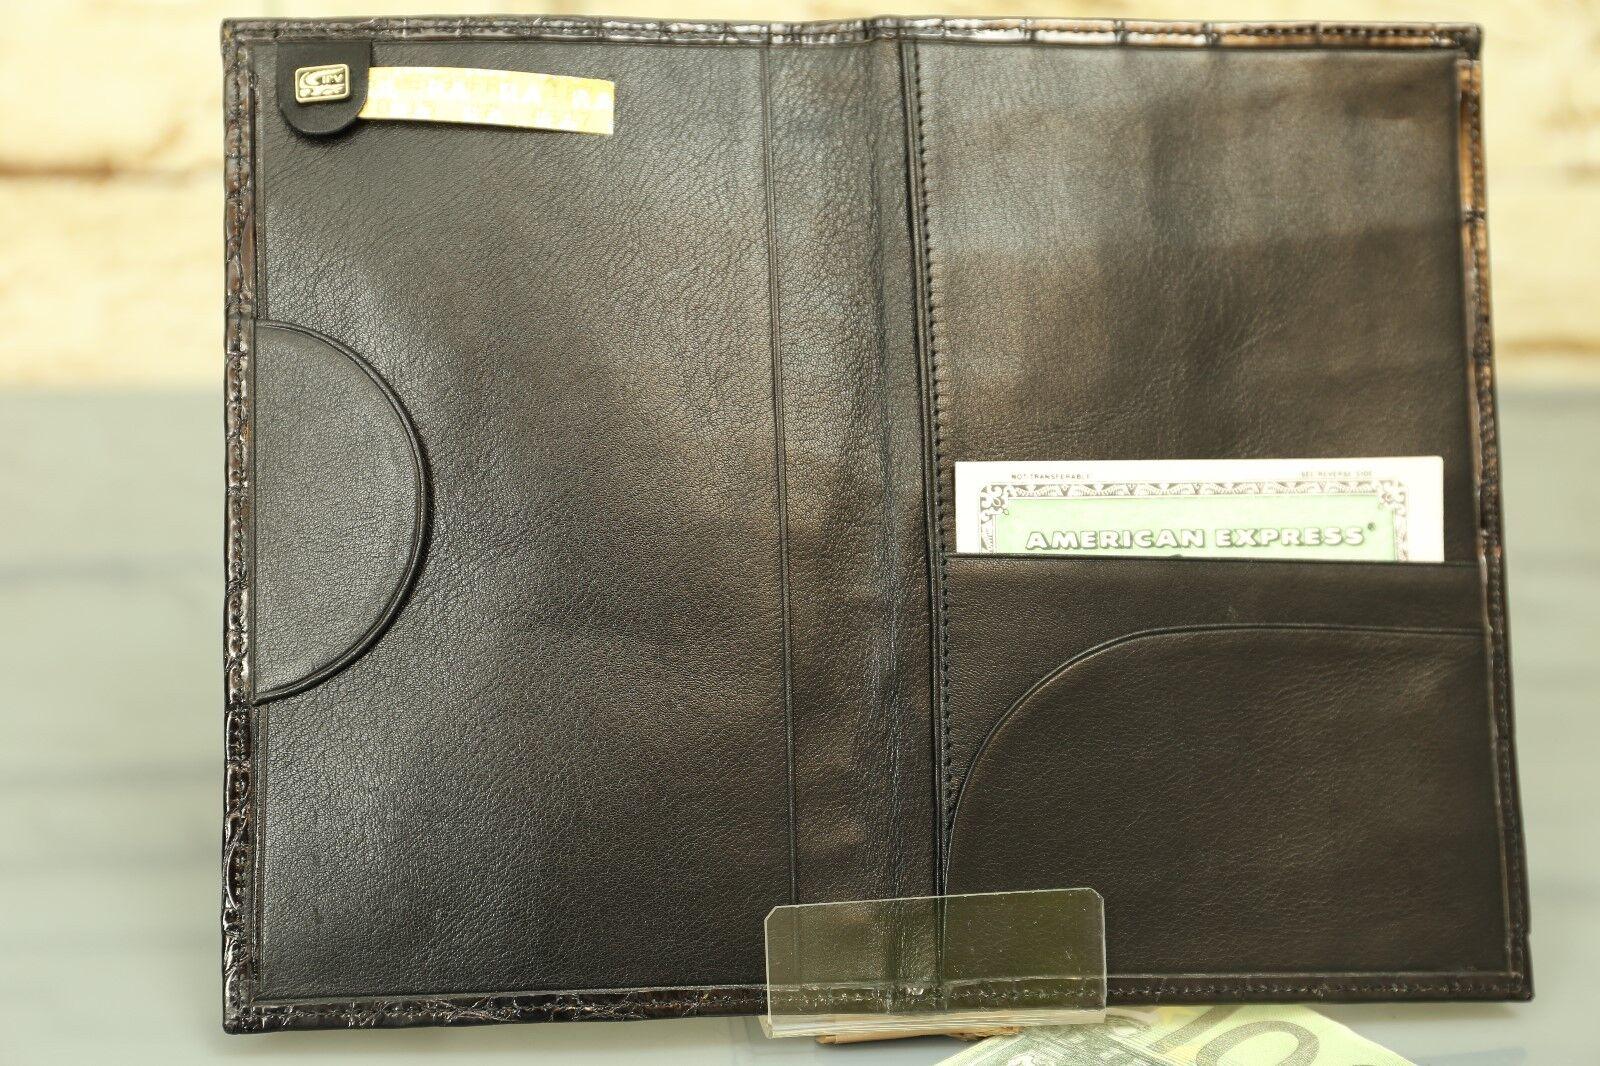 Brieftasche KRALLE - Echtes Krokodil Leder  IRV NEU NEU NEU  Wallet crocodile NEW  n830    | Erste Qualität  8b9b1c